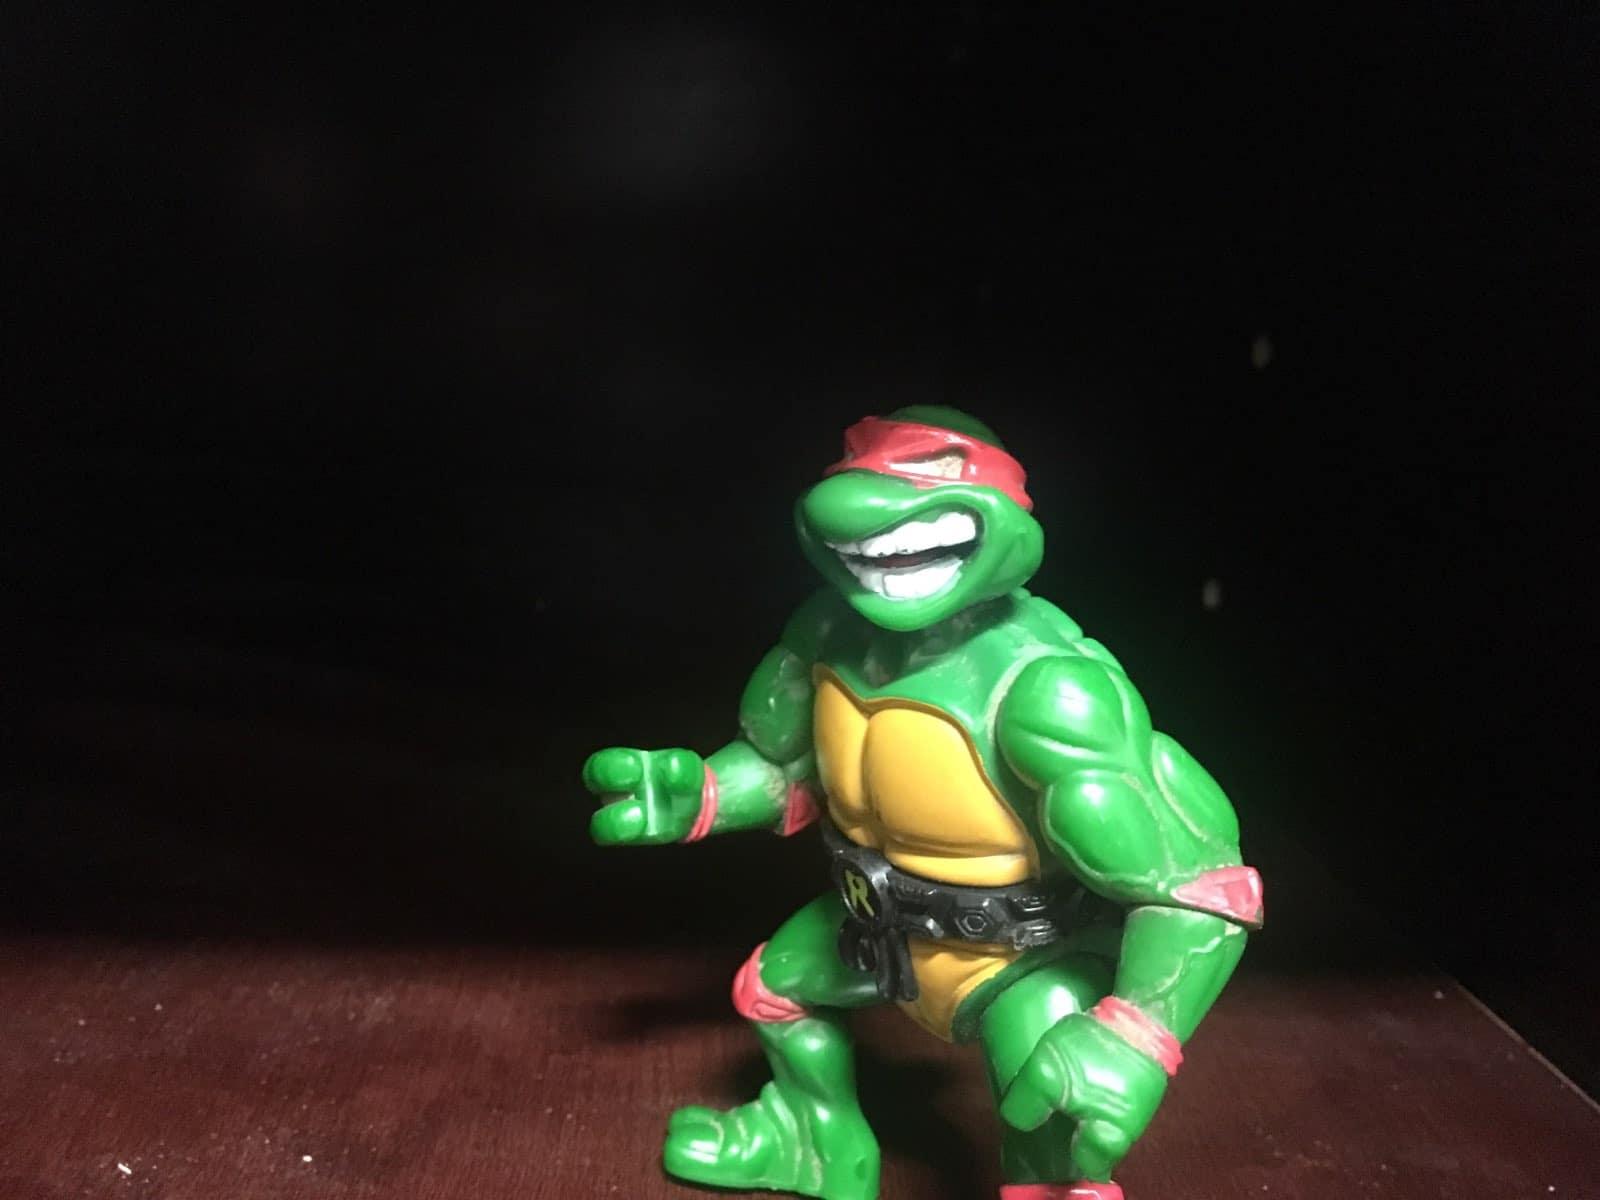 kitchen-vs-bathroom-wars-best-online-cabinets-ninja-turtle-raphael